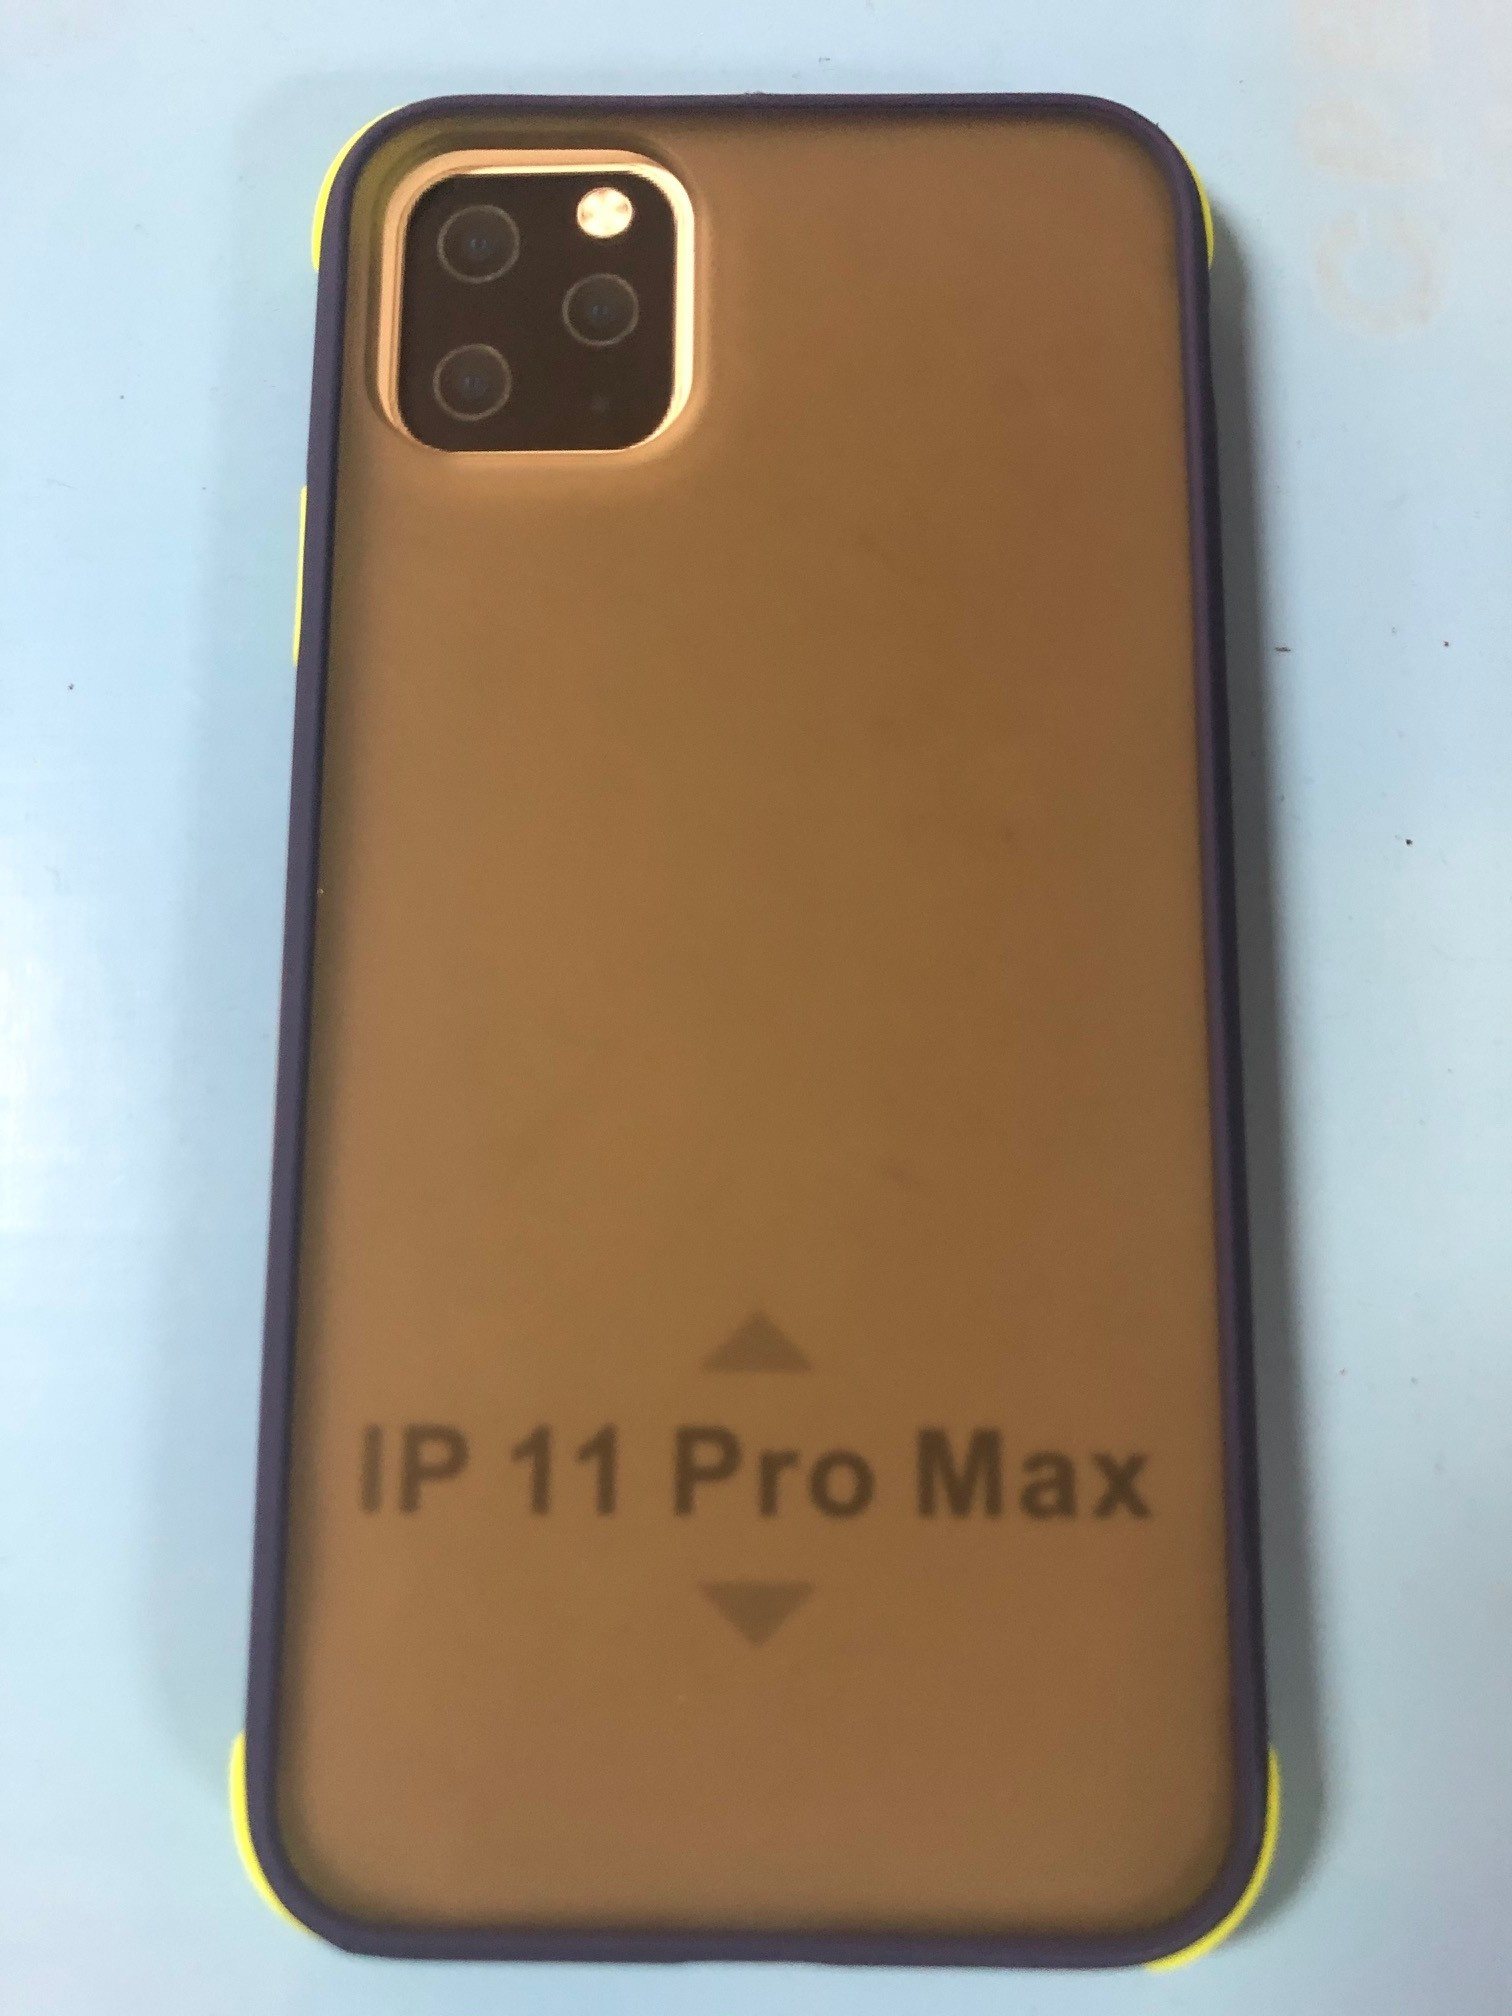 ip 11 pro max